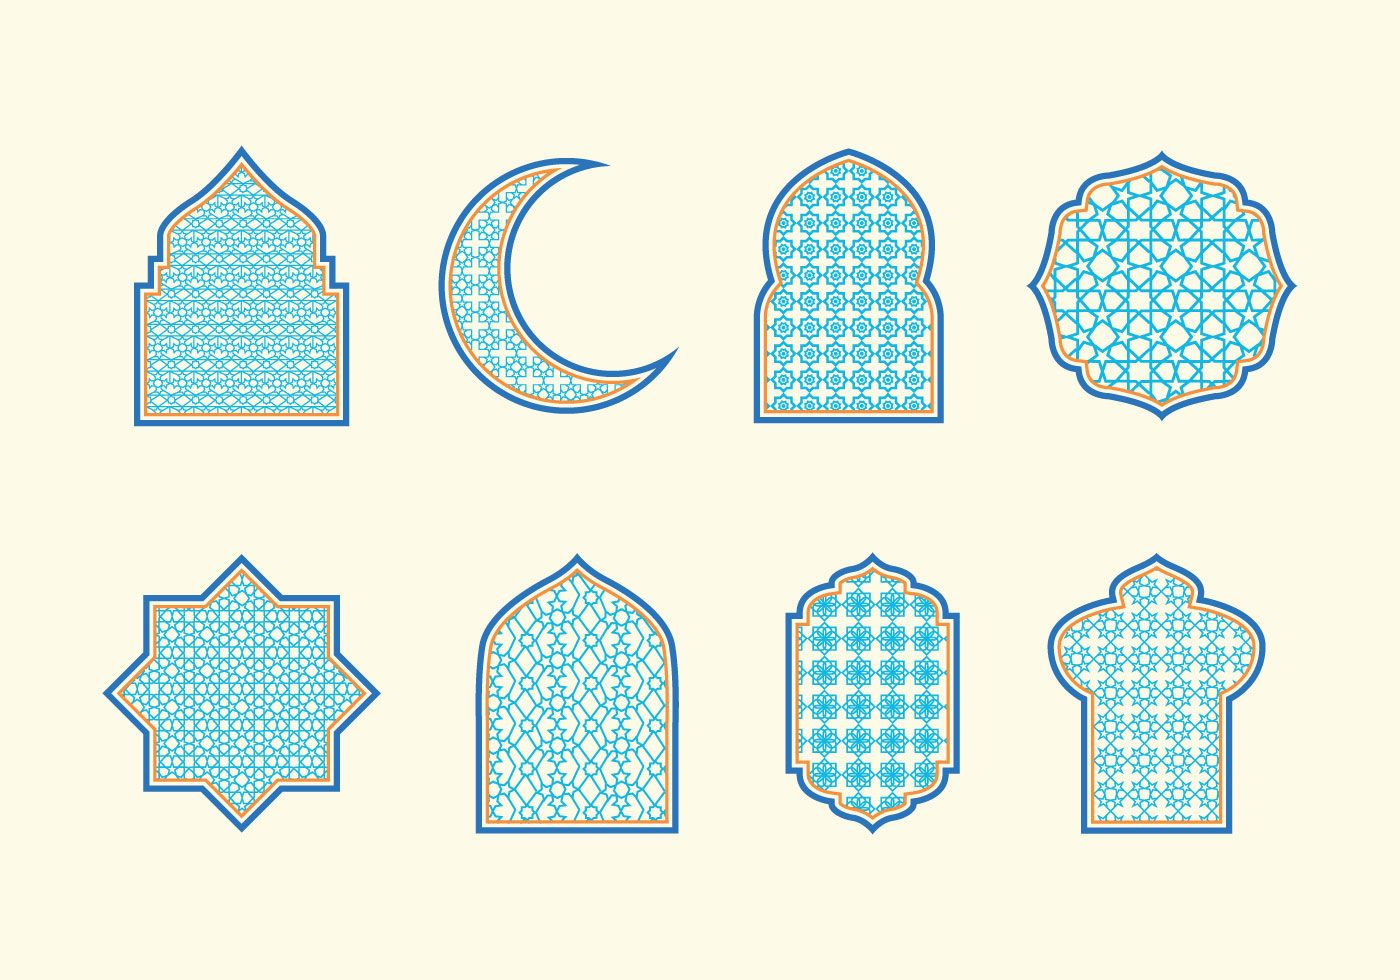 Islamicdecorations clipart image free download Islamic Ornaments Vector | Islamic Art/Ceramics | Free vector art ... image free download